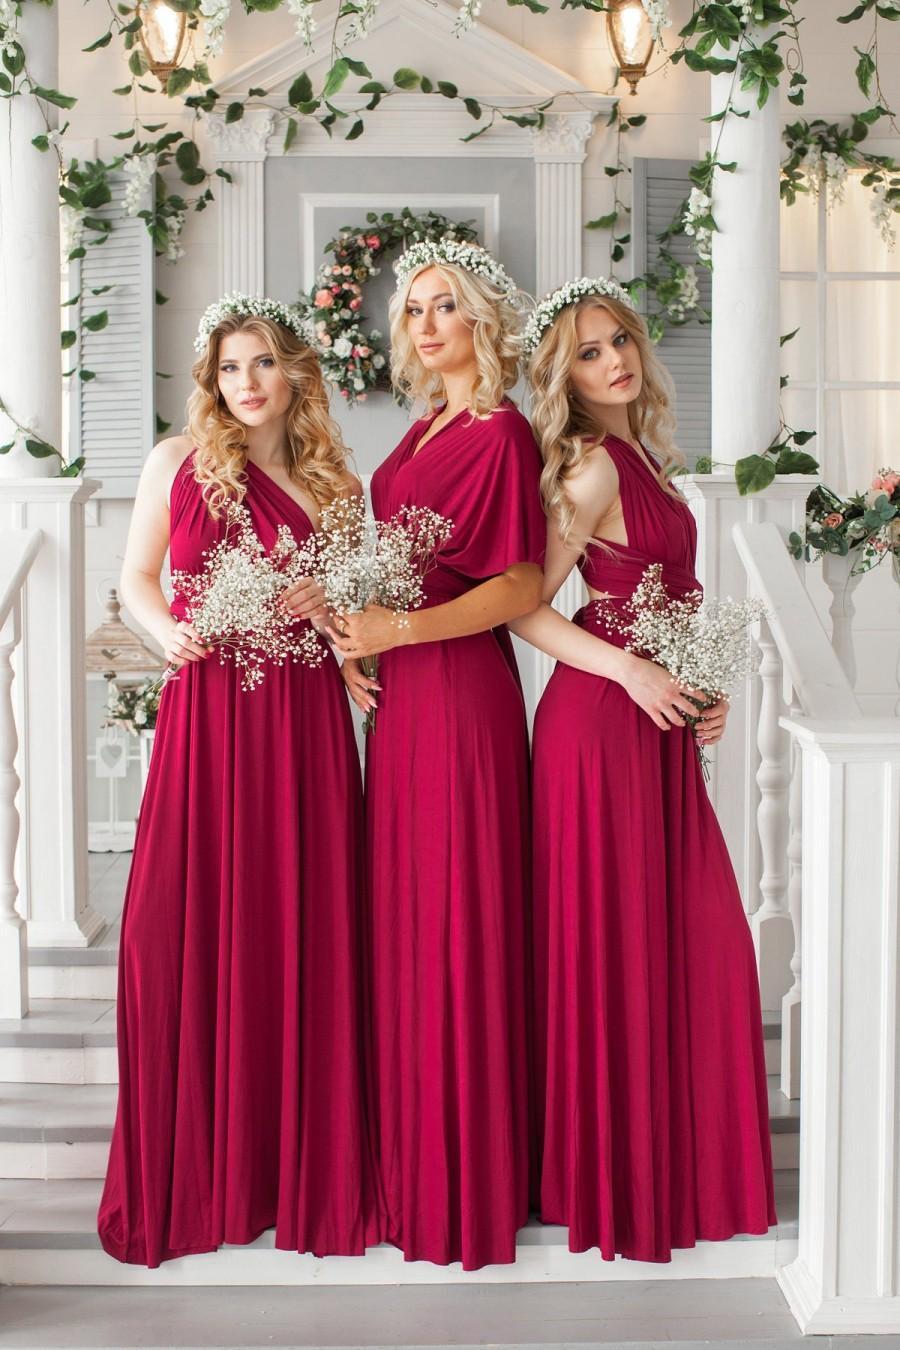 Mariage - Bridesmaid Dress // Infinity Dress // Convertible Dress // Wrap Dress // Prom Dress // Multiway Dress // Party Dress //Ship from New York